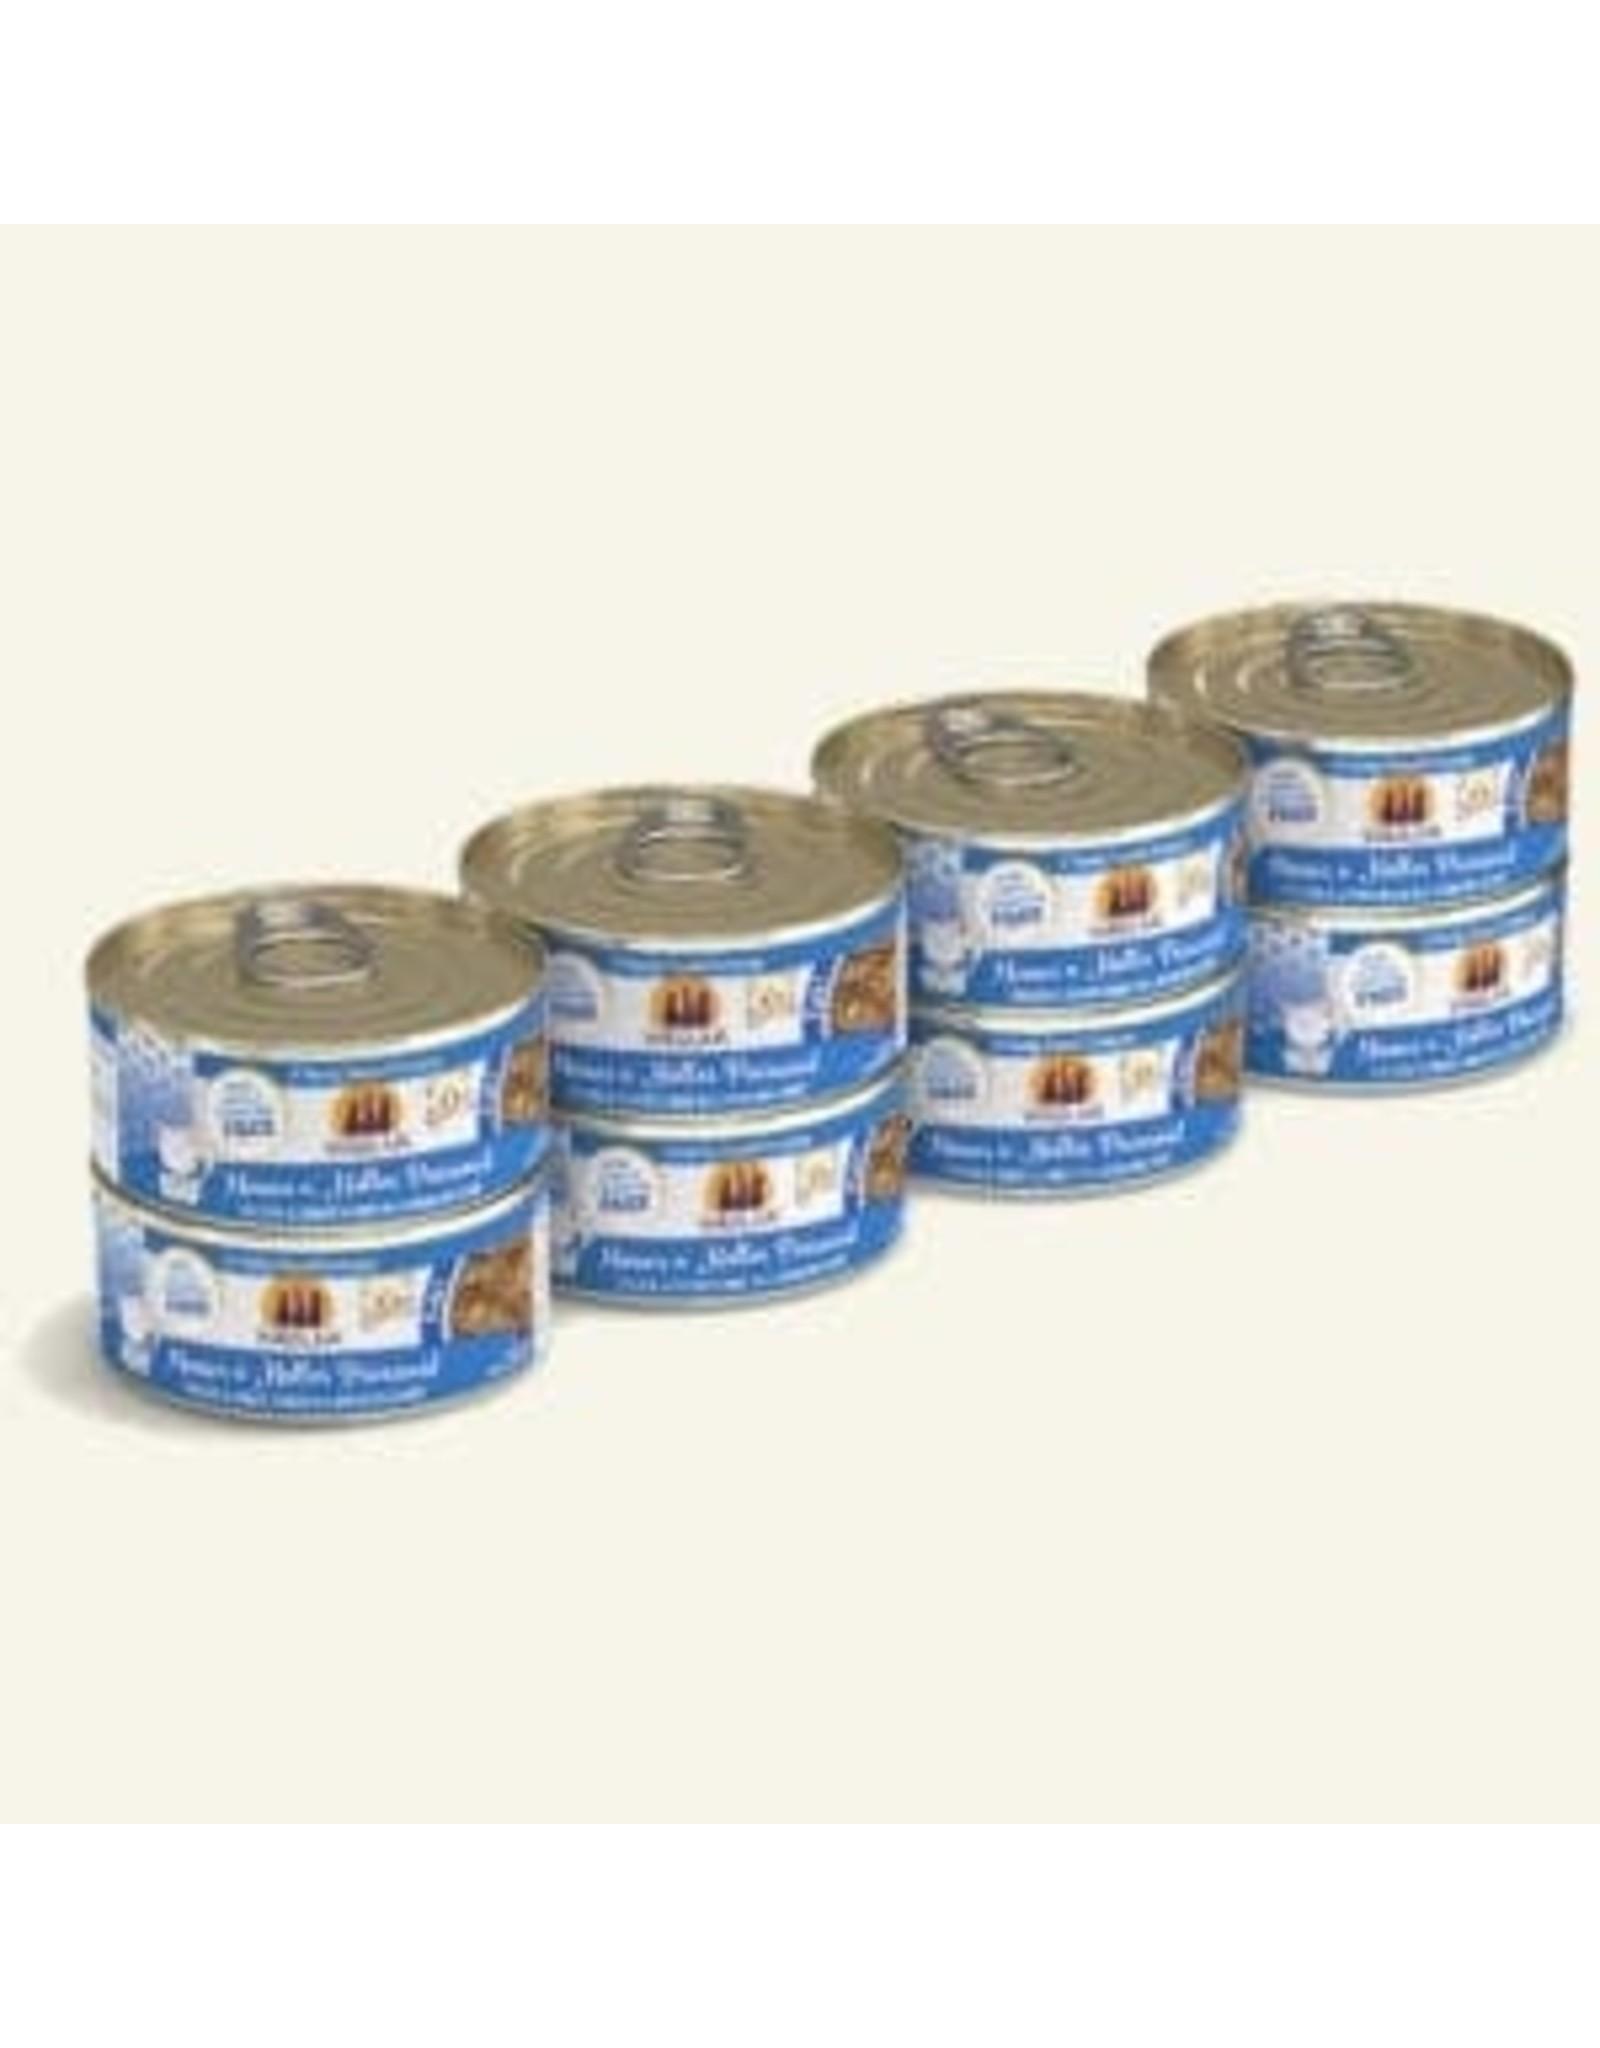 Weruva Weruva Meows n' Holler Purramid Chicken & Shrimp Dinner Pate Cat Food 5.5oz